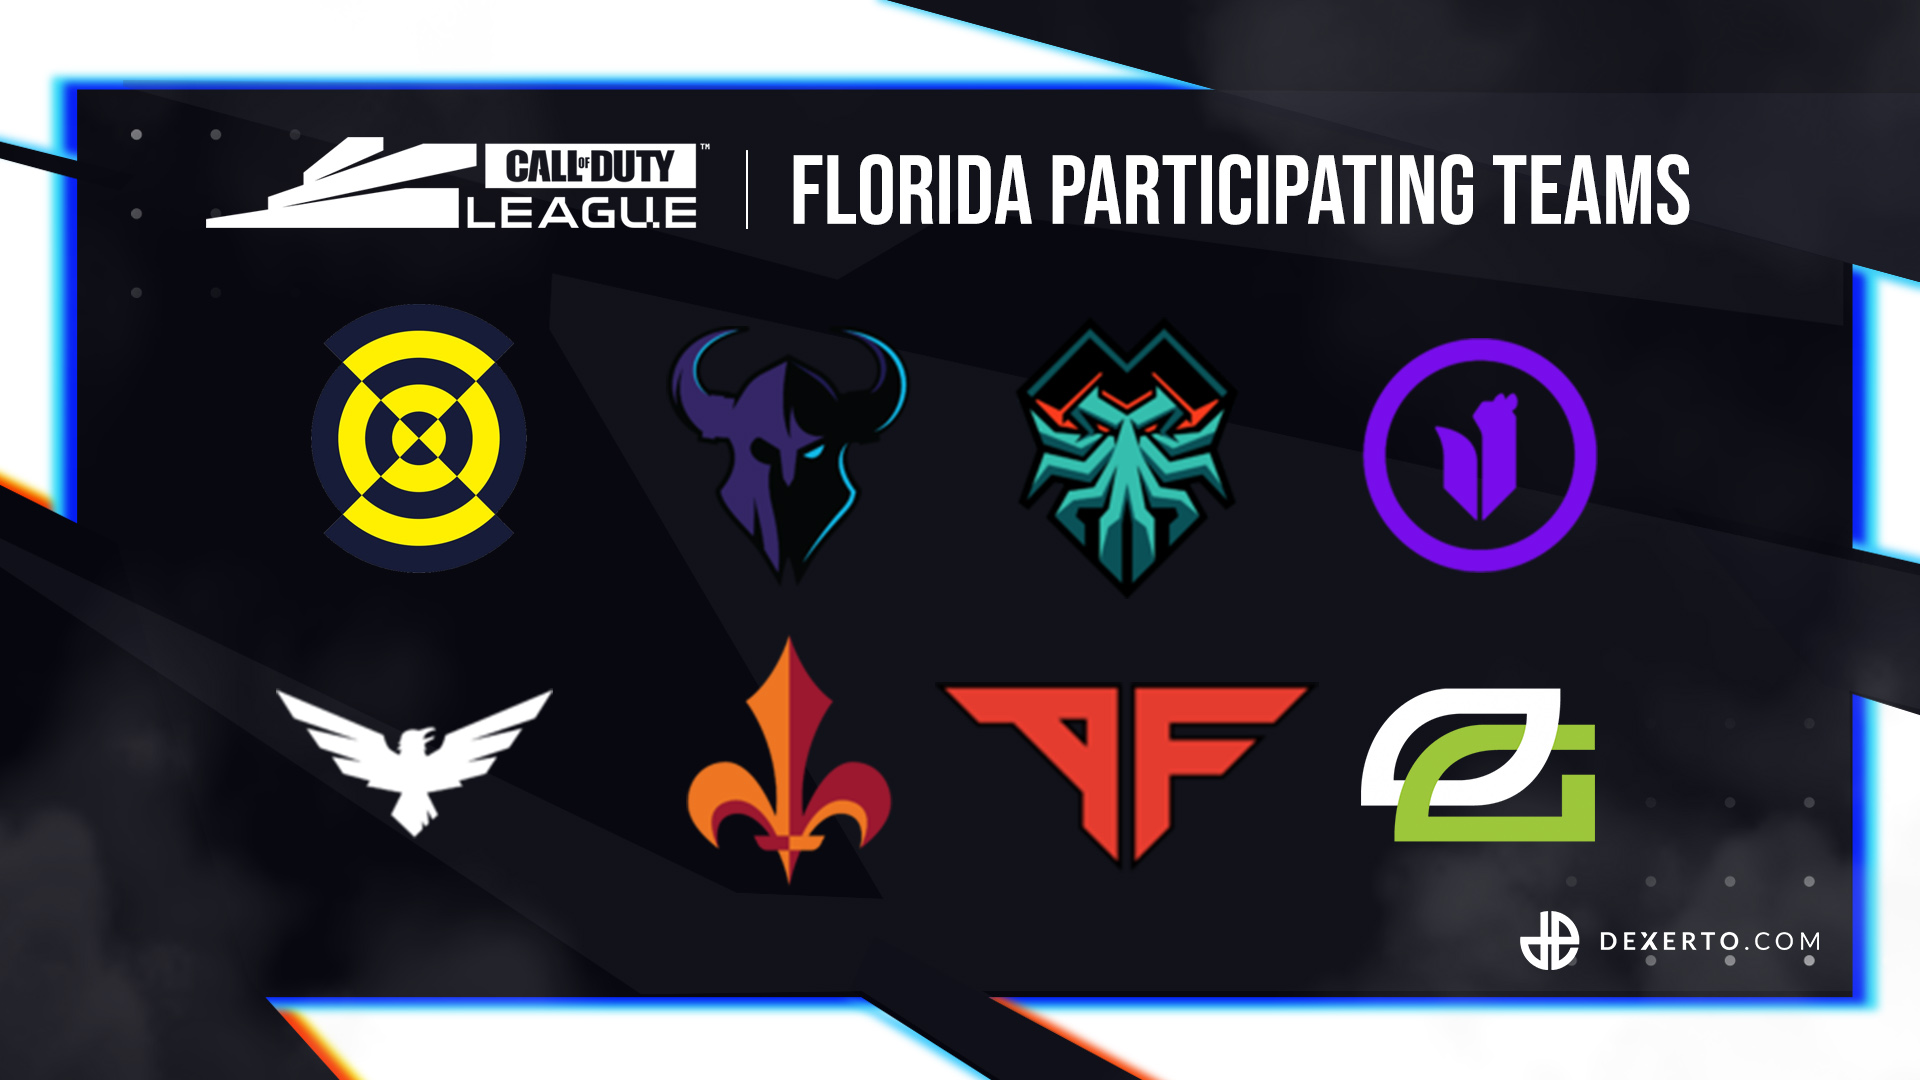 CDL Florida participating teams.